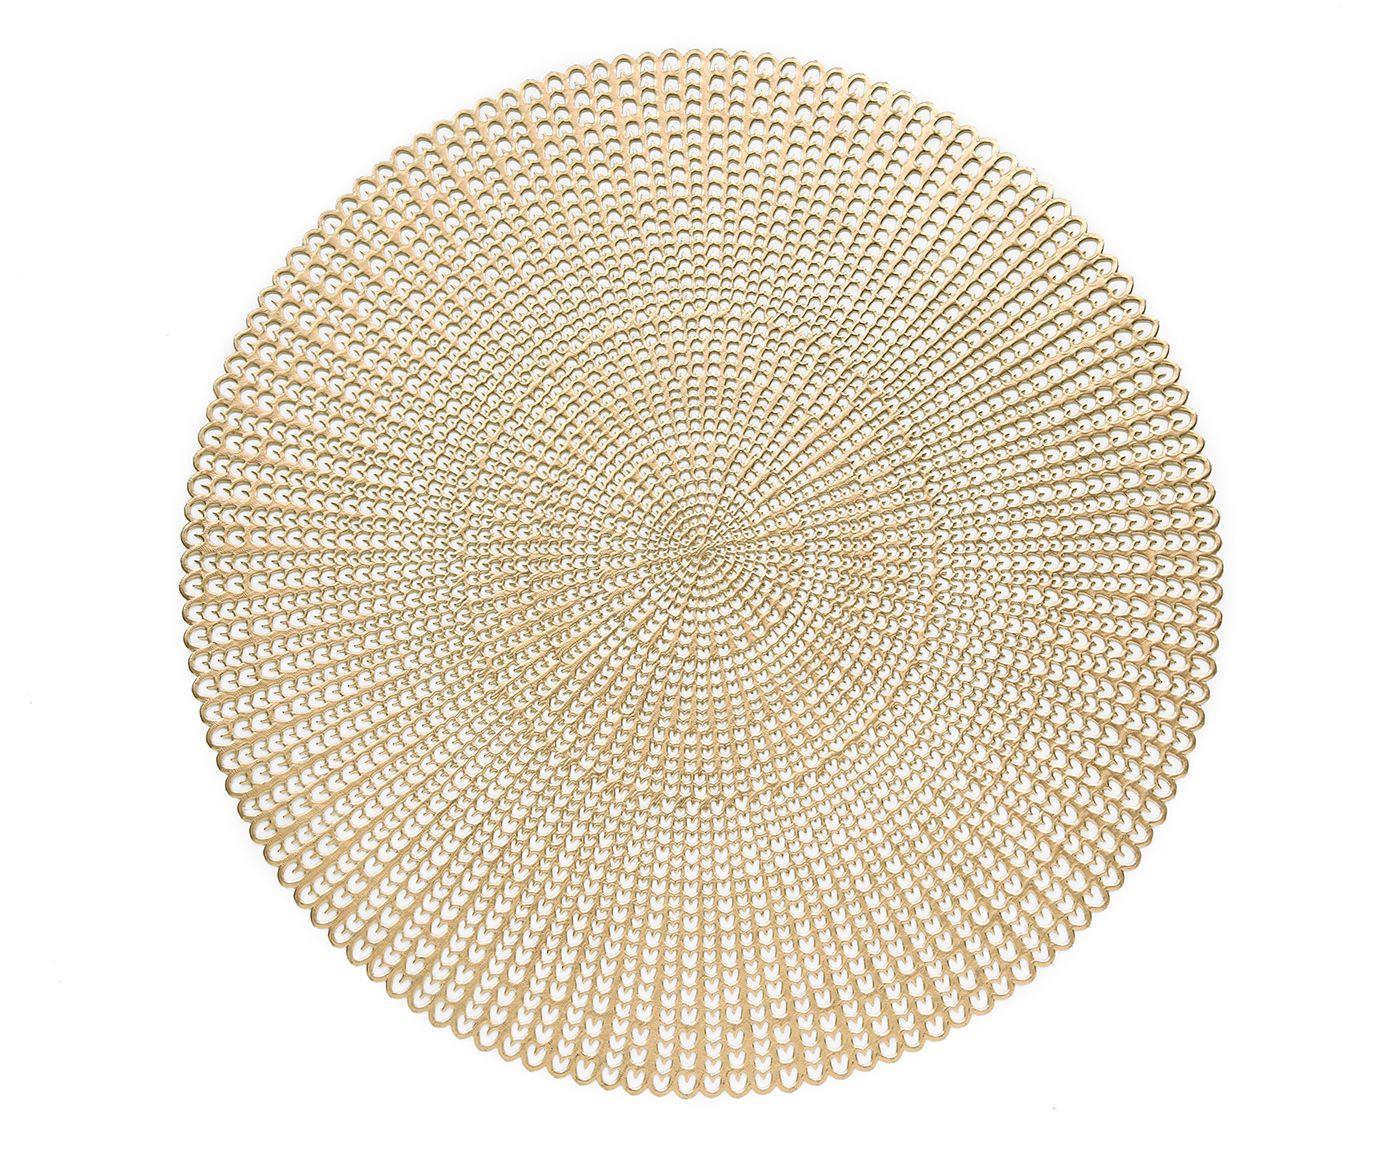 Sousplat Concept Dourado - 42cm   Westwing.com.br